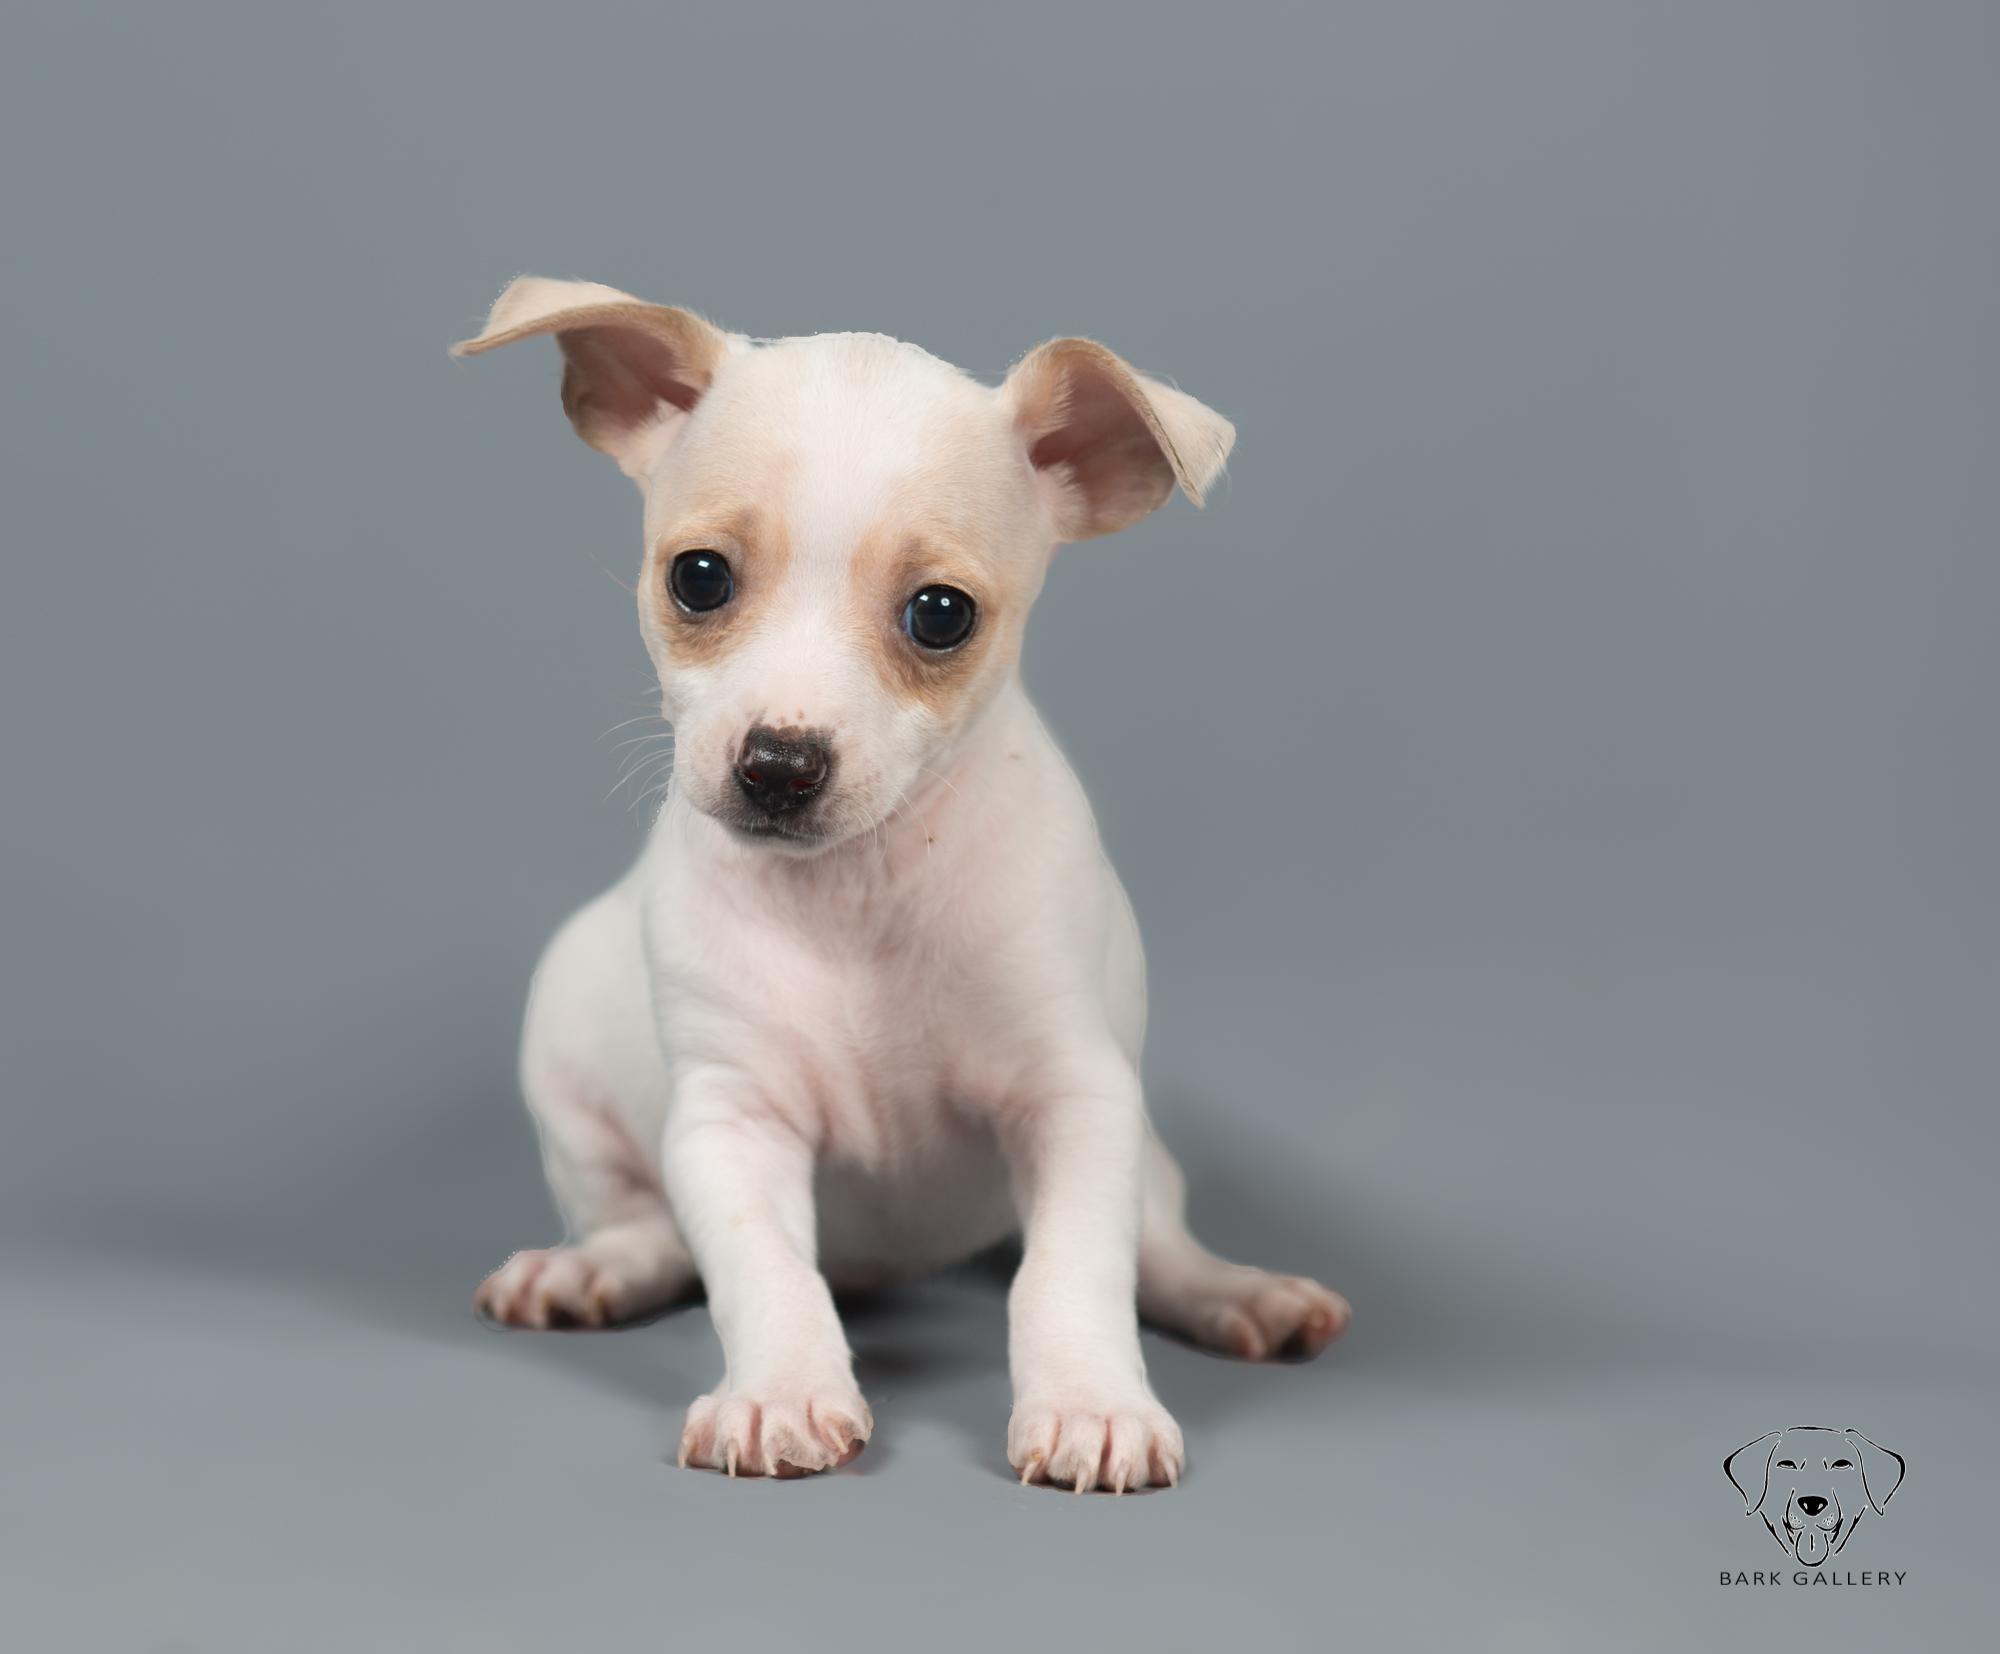 puppy-portrait-photographer-vierkandt-rick